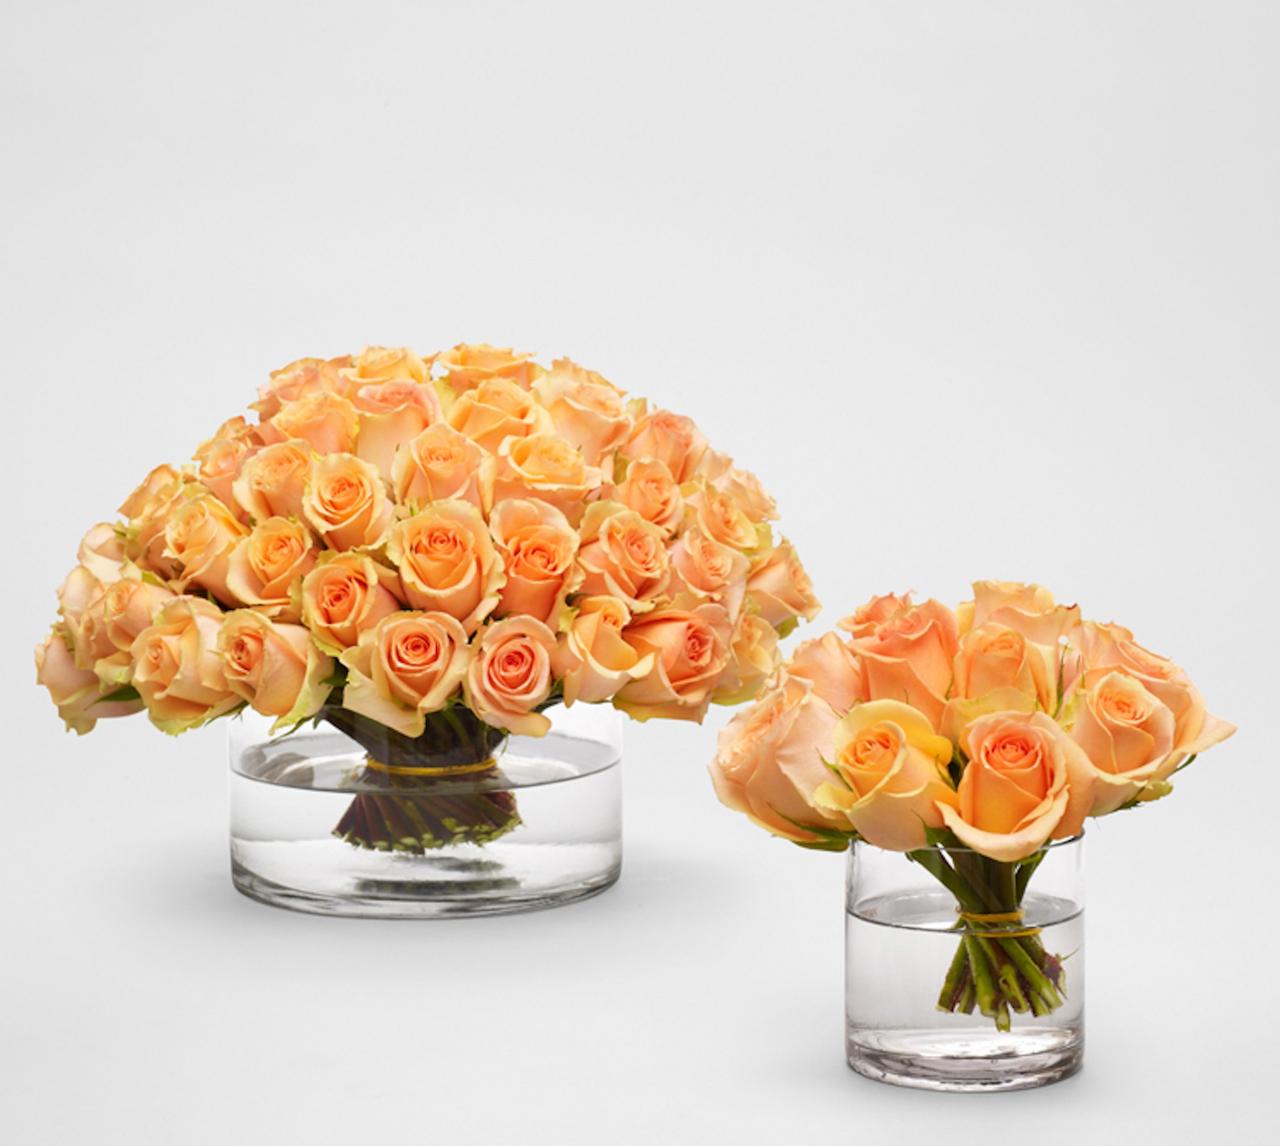 f5-ryan-korban-lolivier-flowers